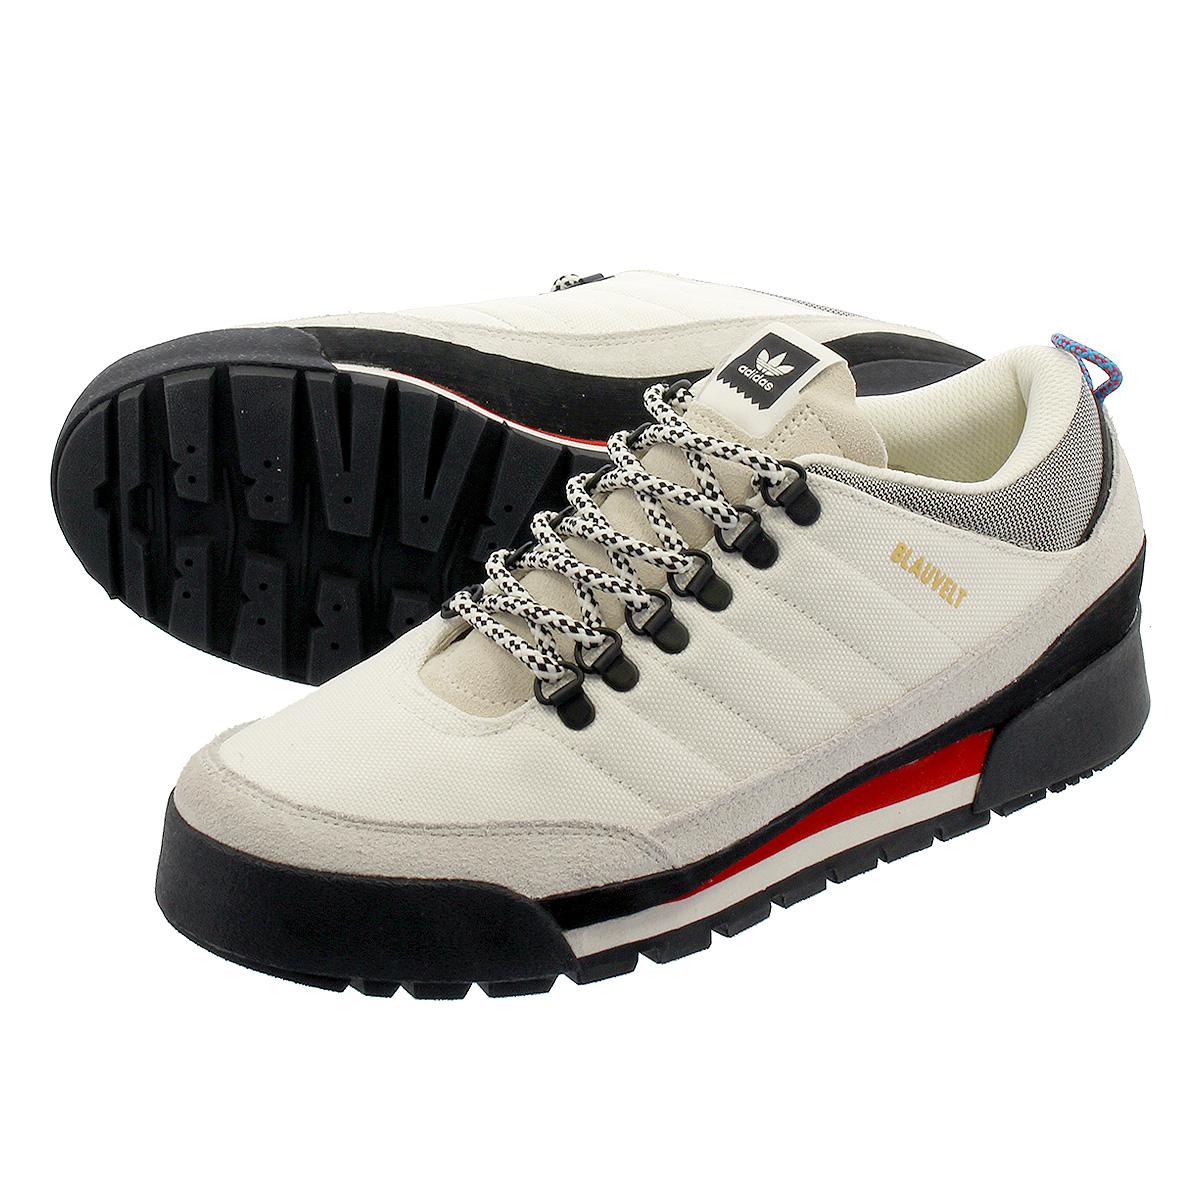 LOWTEX PLUS  adidas JAKE BOOT 2.0 LOW Adidas Jake boots 2.0 low OFF WHITE RAW  WHITE CORE BLACK db3162  cc6d84884